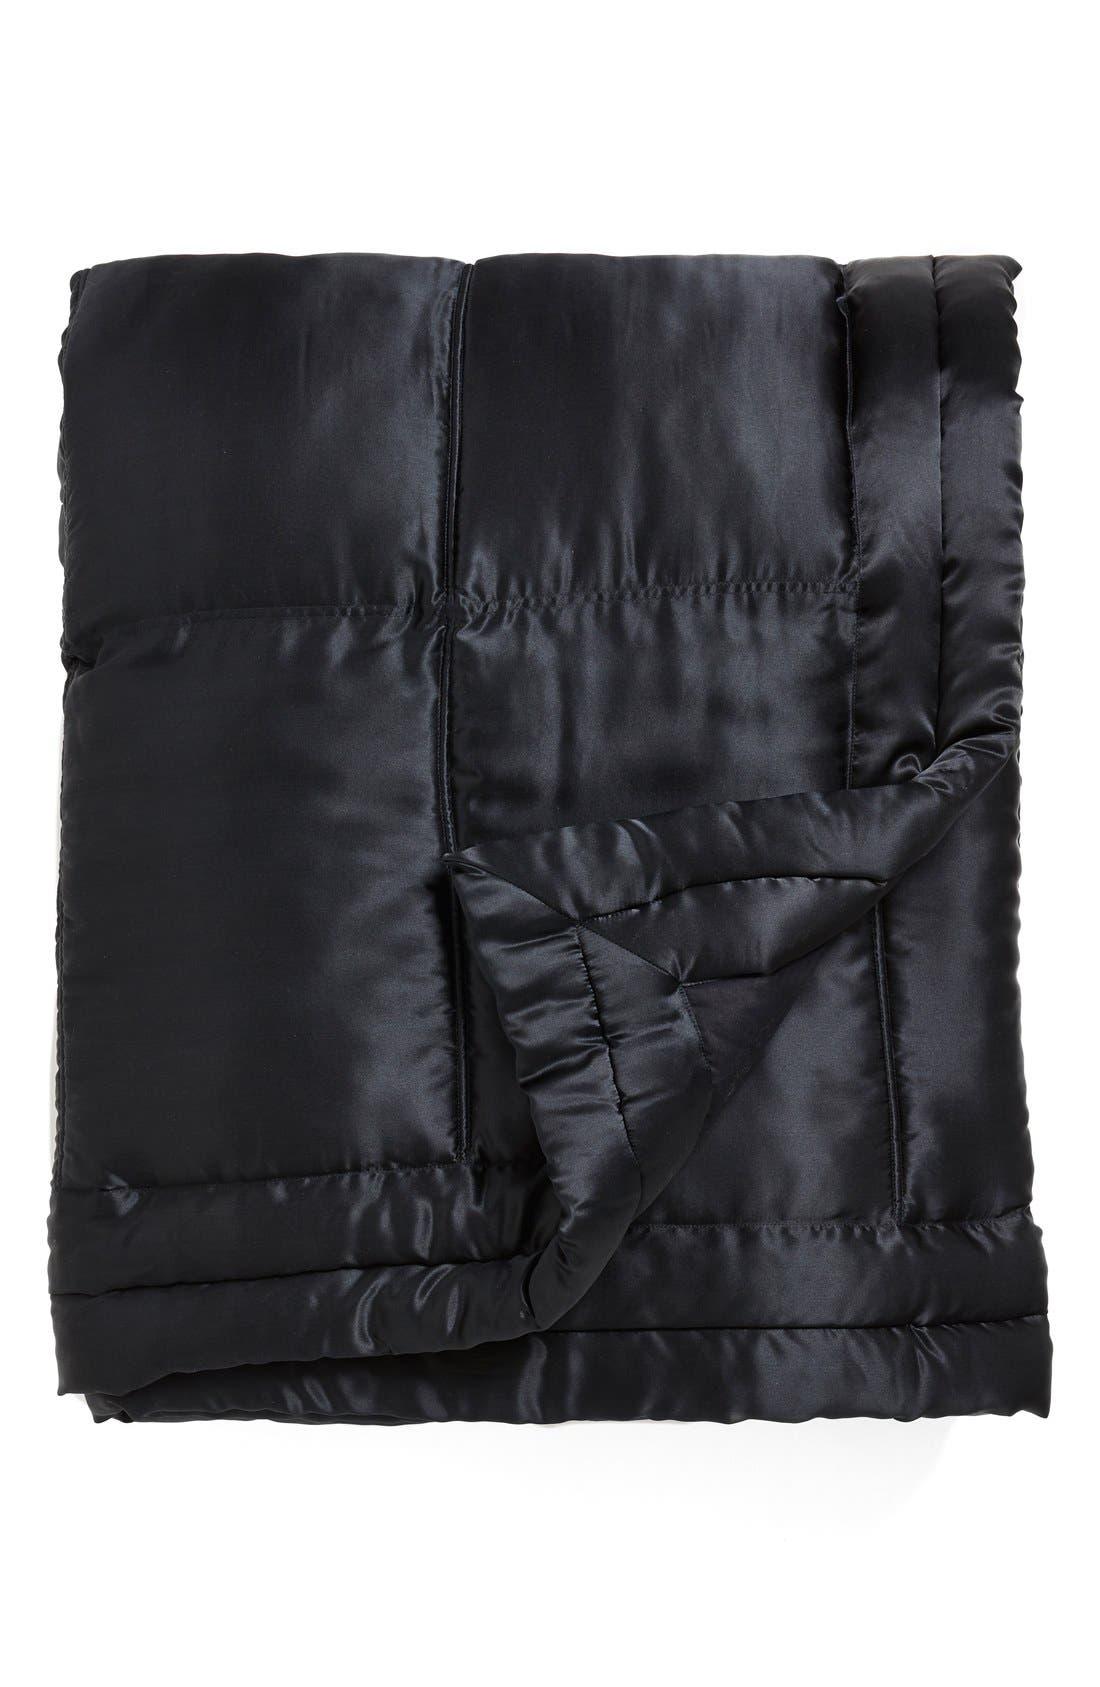 Donna Karan Collection 'Impression' Silk Charmeuse Quilt